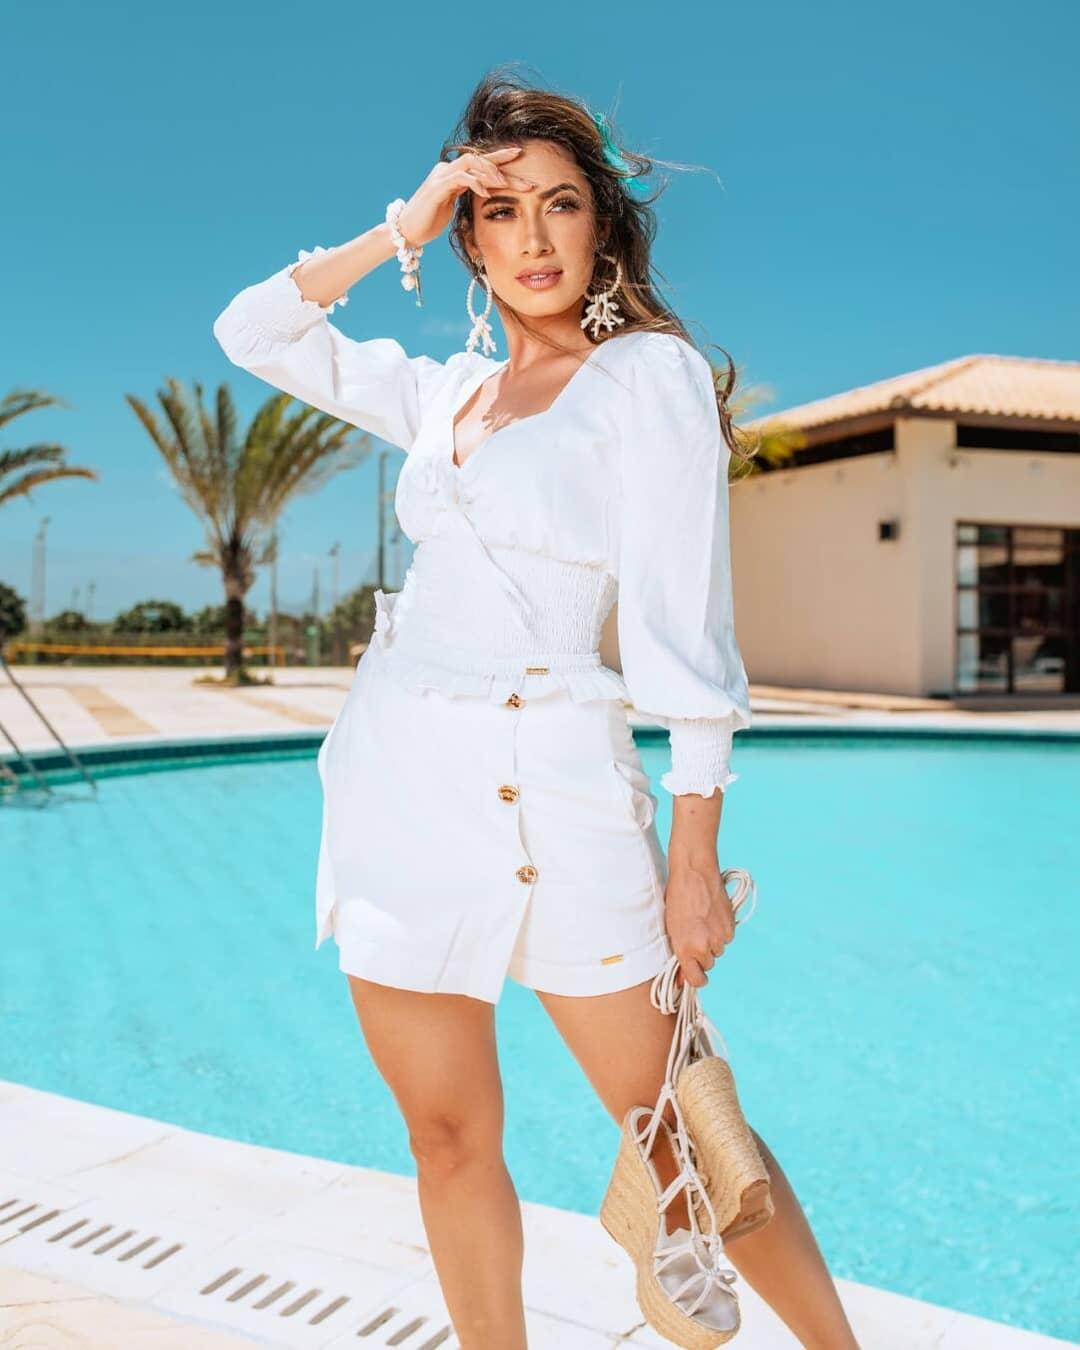 natalia gurgel, top model brasil 2021/miss morada nova 2019/miss sertao central empresarial 2018/top 20 de miss asia pacific international 2018, representando o uruguai. - Página 6 21373414